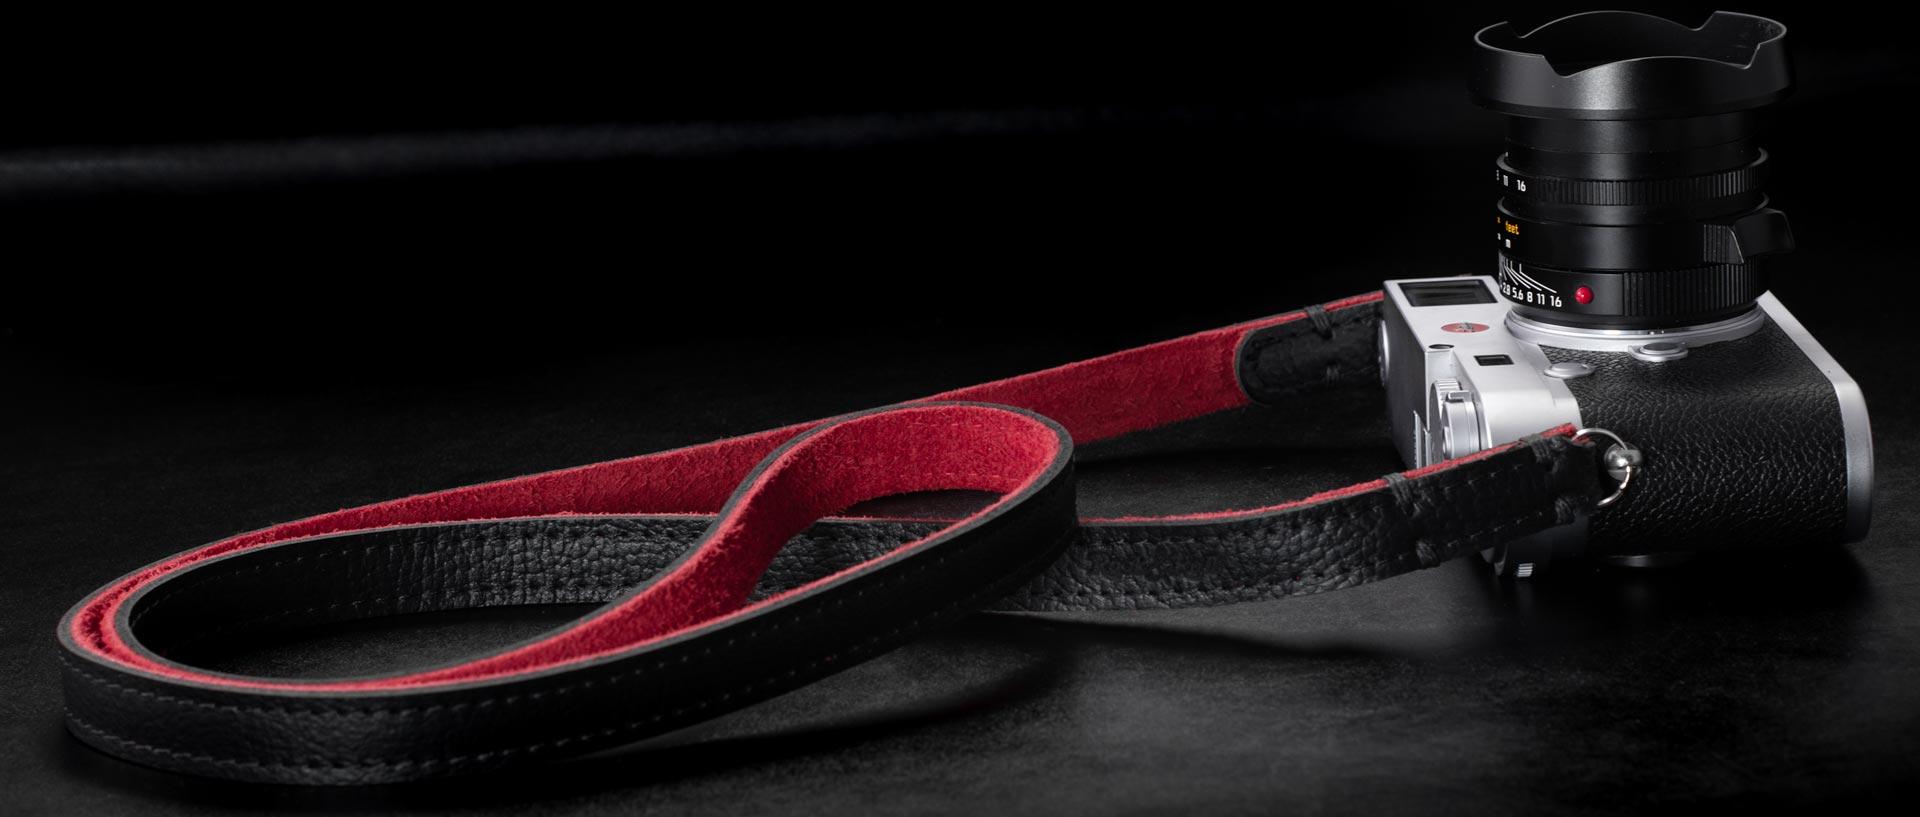 Riviera straps